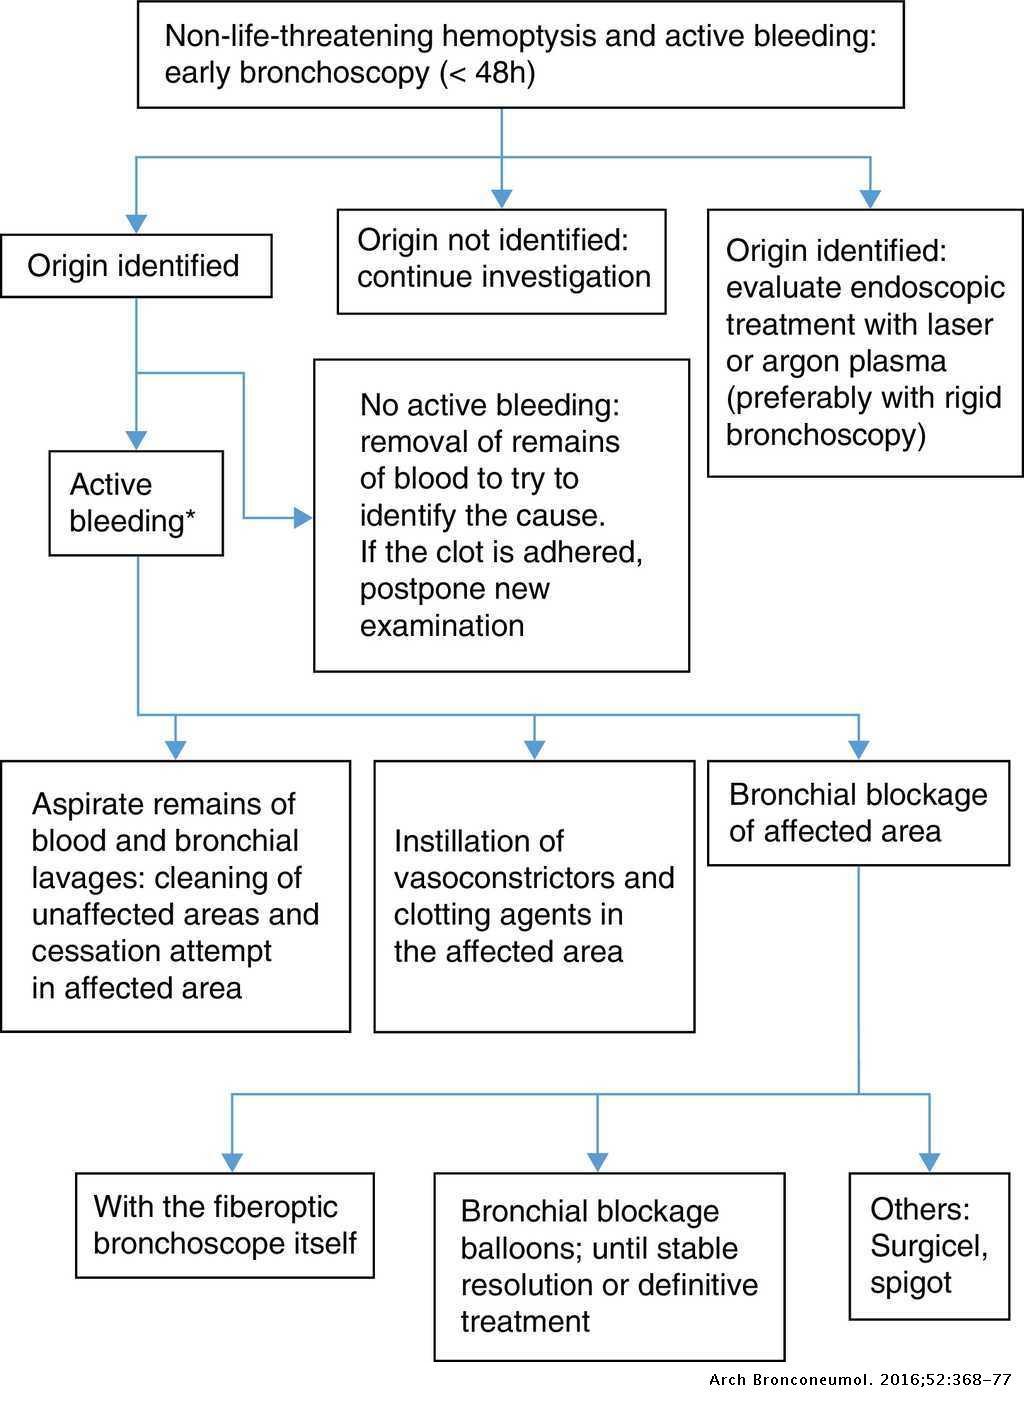 Diagnosis and Treatment of Hemoptysis | Archivos de